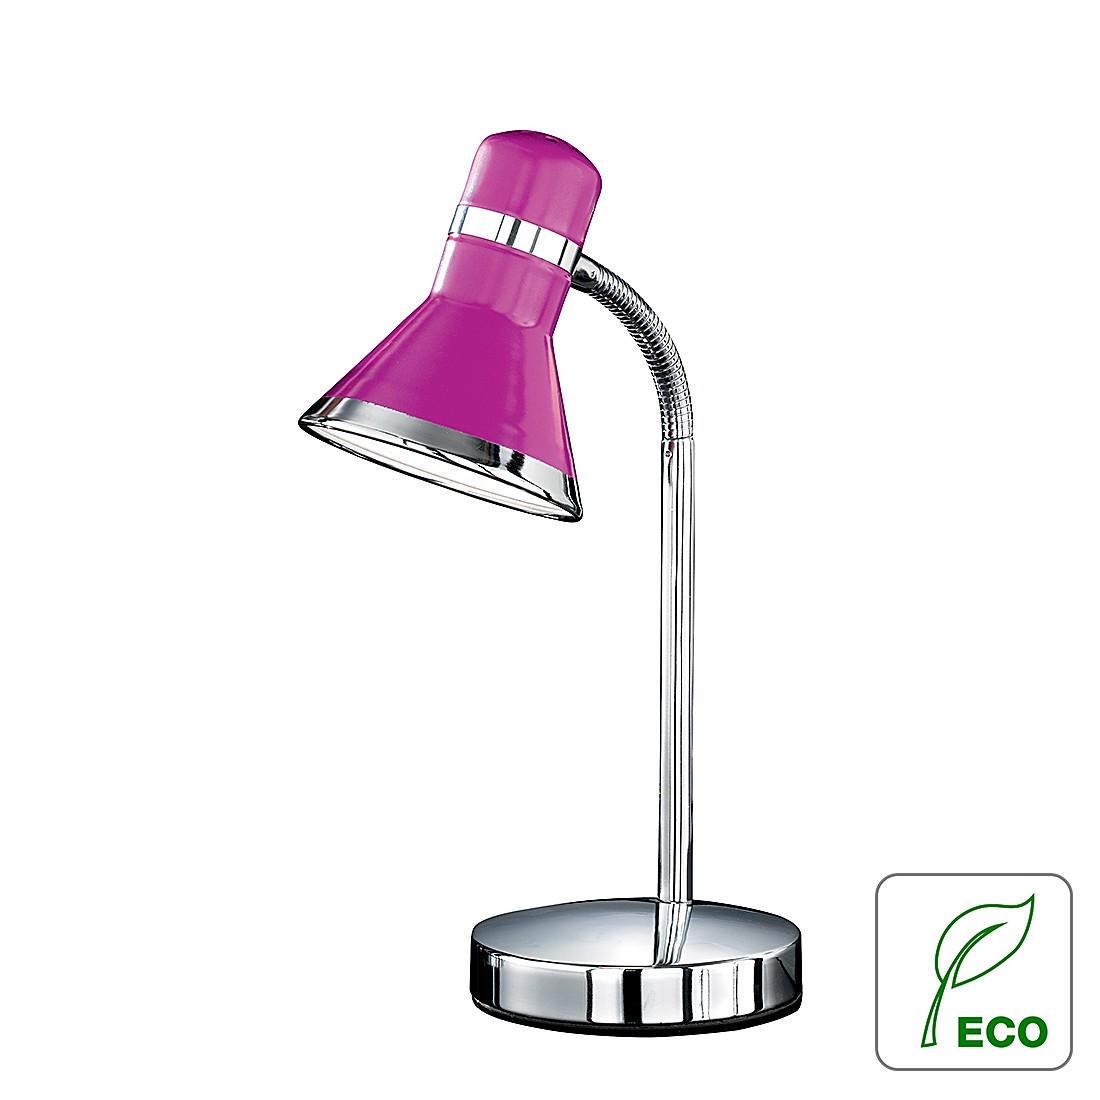 Home 24 - Eek a++, lampe de table foco - 1 ampoule, honsel